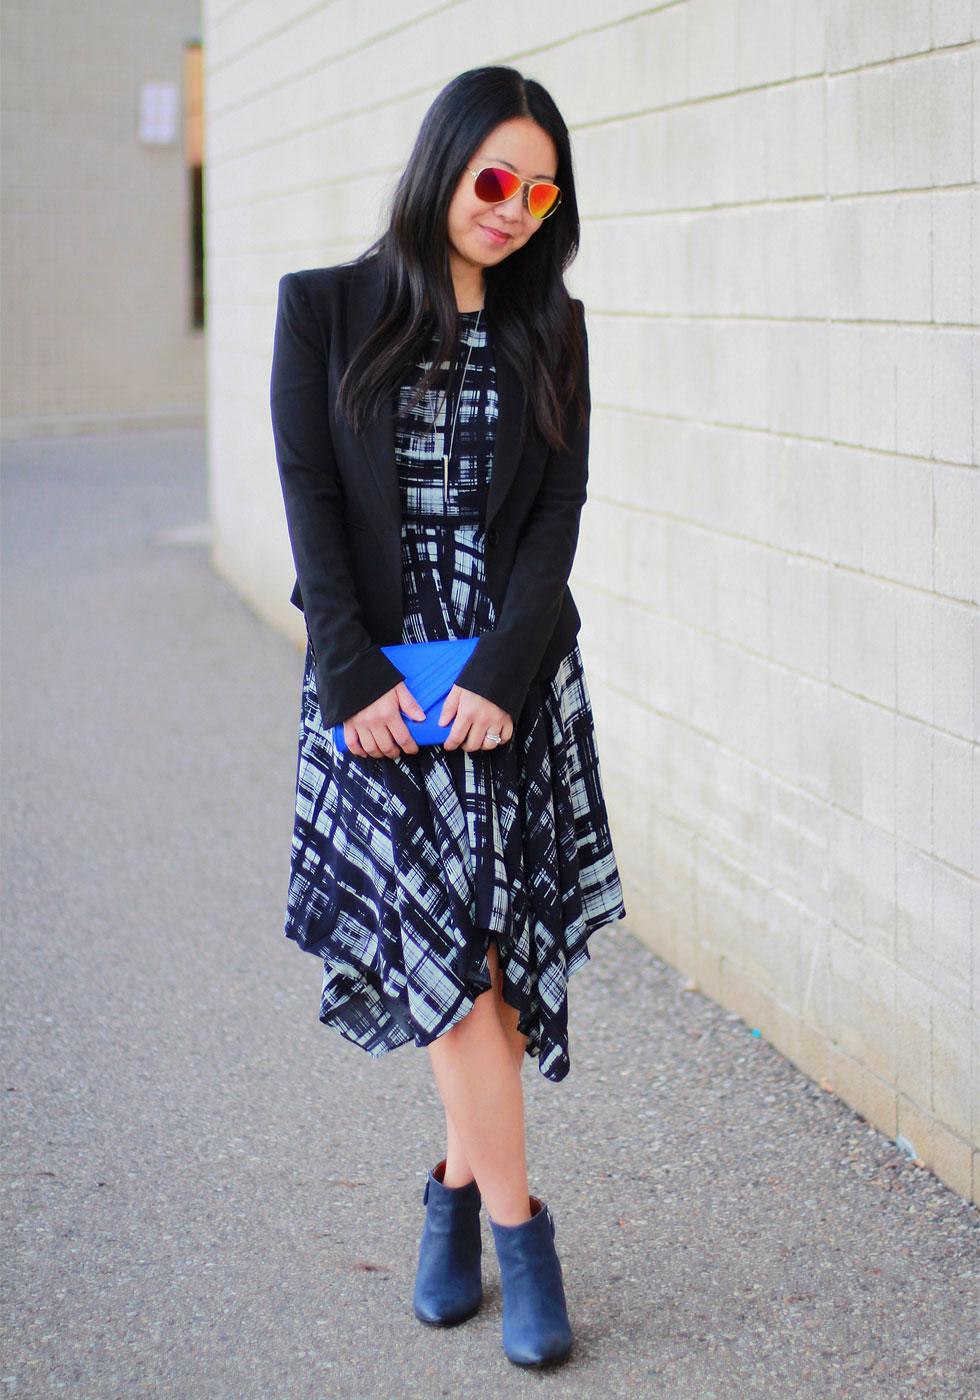 Cynthia Yang - 5